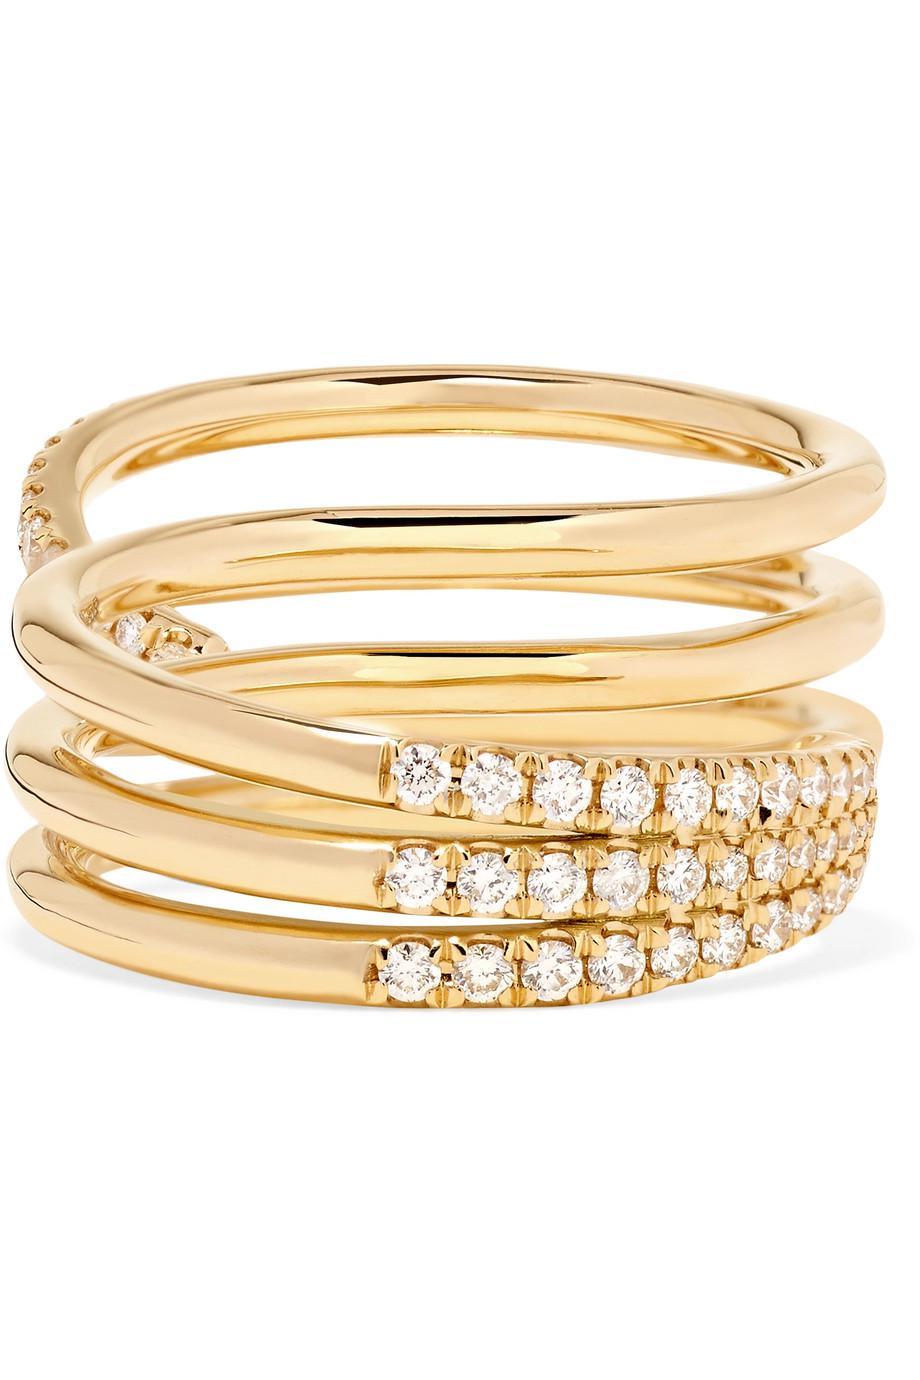 Melissa Kaye 18-karat Gold Diamond Two-finger Ring ISWDDID9iL